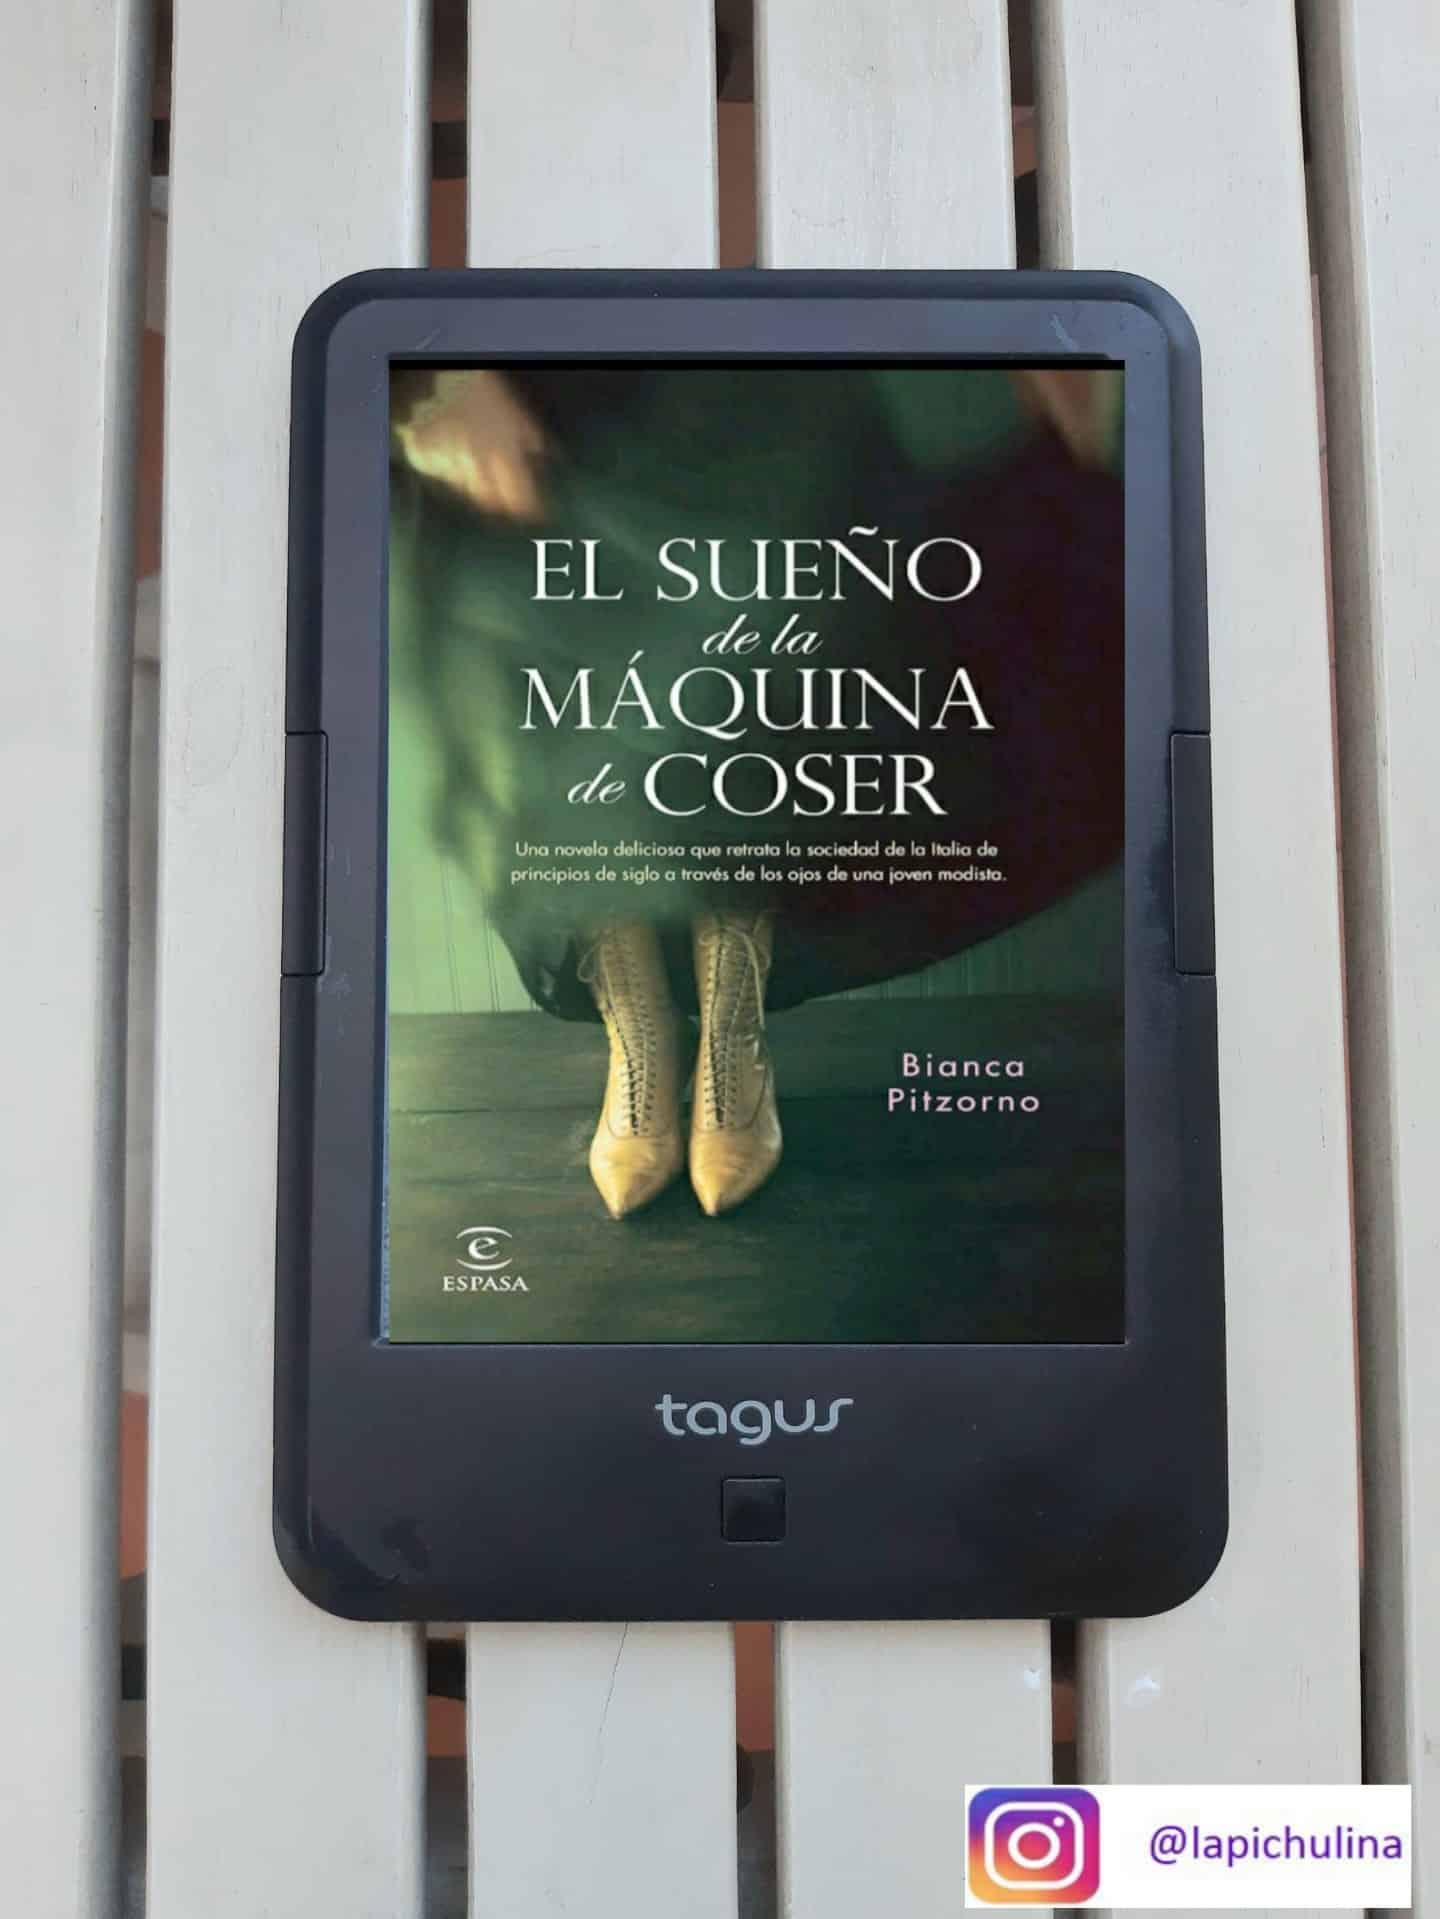 «EL SUEÑO DE LA MAQUINA DE COSER», de Bianca Pitzorno